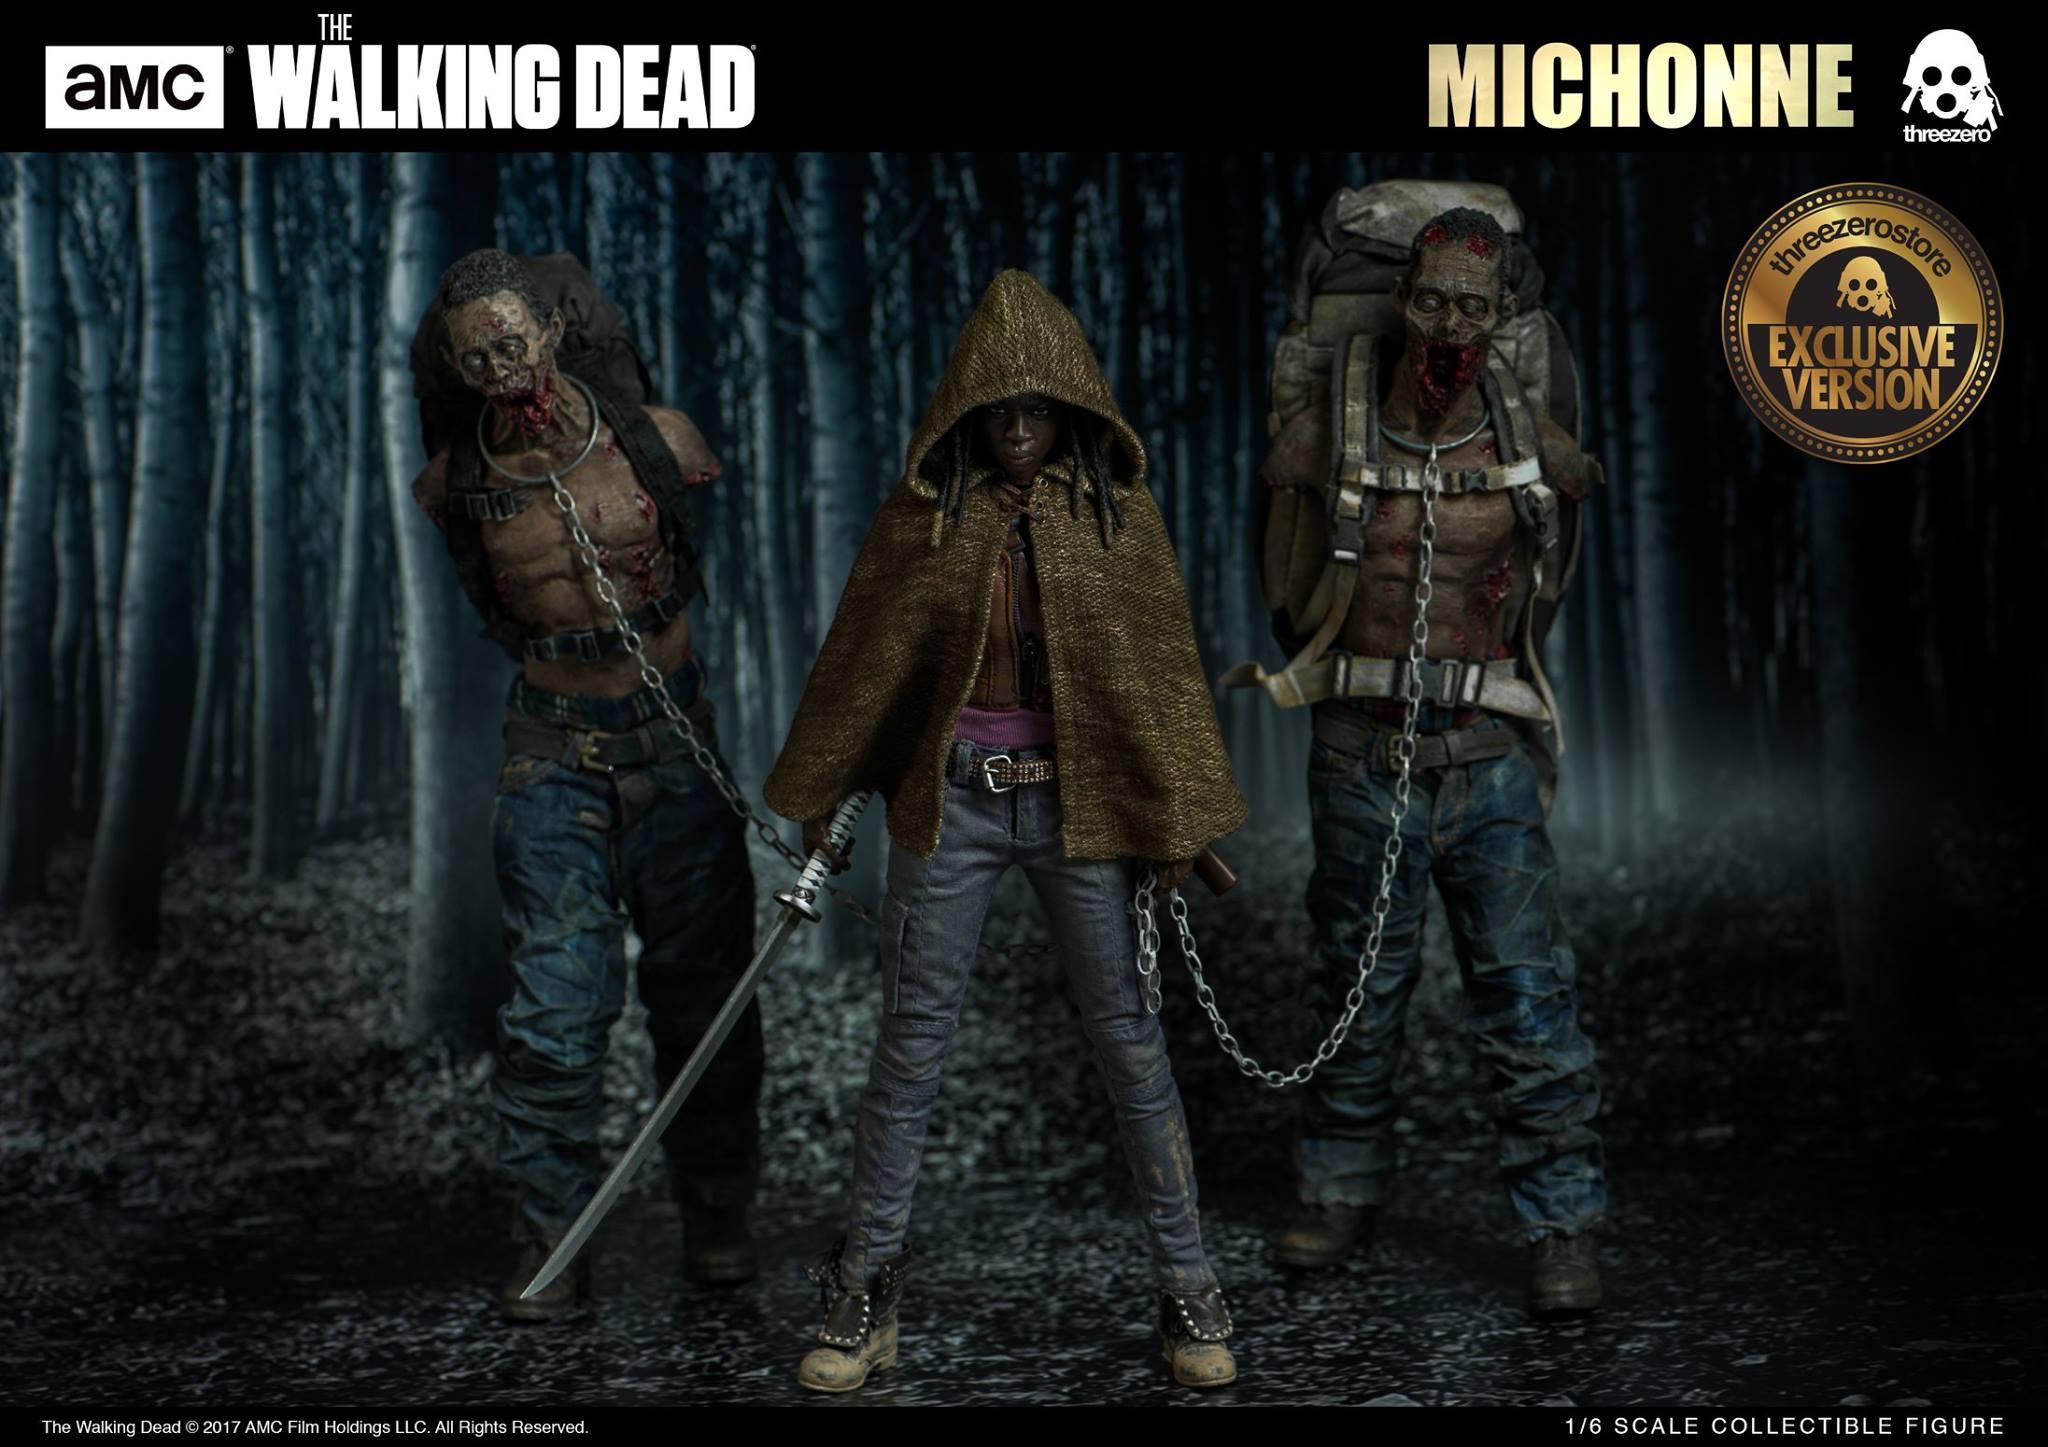 Threezero 3Z0019 + WD-ZG/WD-ZR AMC The Walking Dead - Michonne + Pet Walker Twin Pack (Exclusive Version)